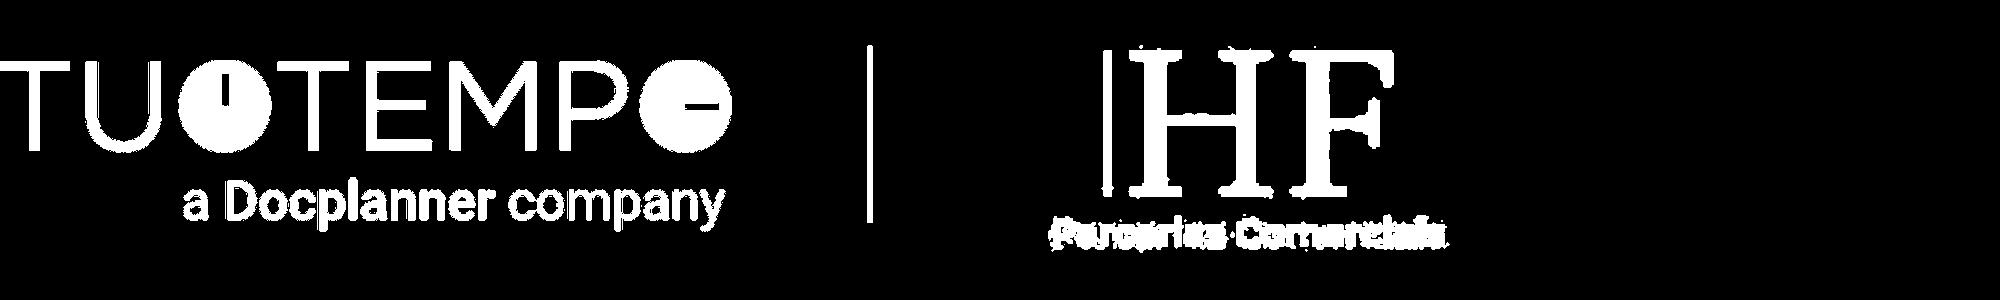 Untitled design (1)-Jun-28-2021-06-50-40-51-PM